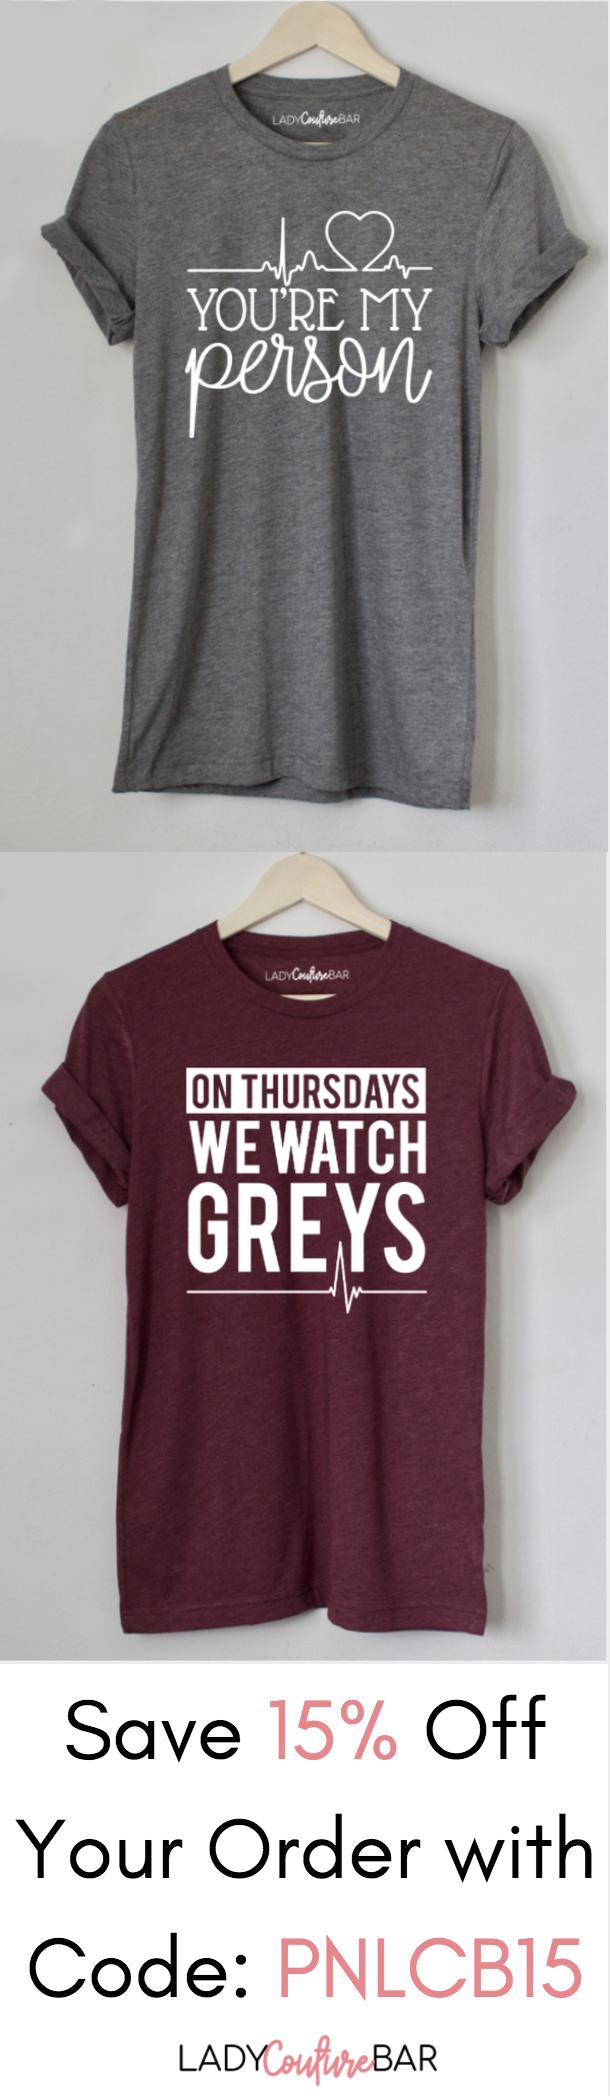 You\'re My Person Shirt, On Thursdays We Watch Greys Shirt, Greys ...